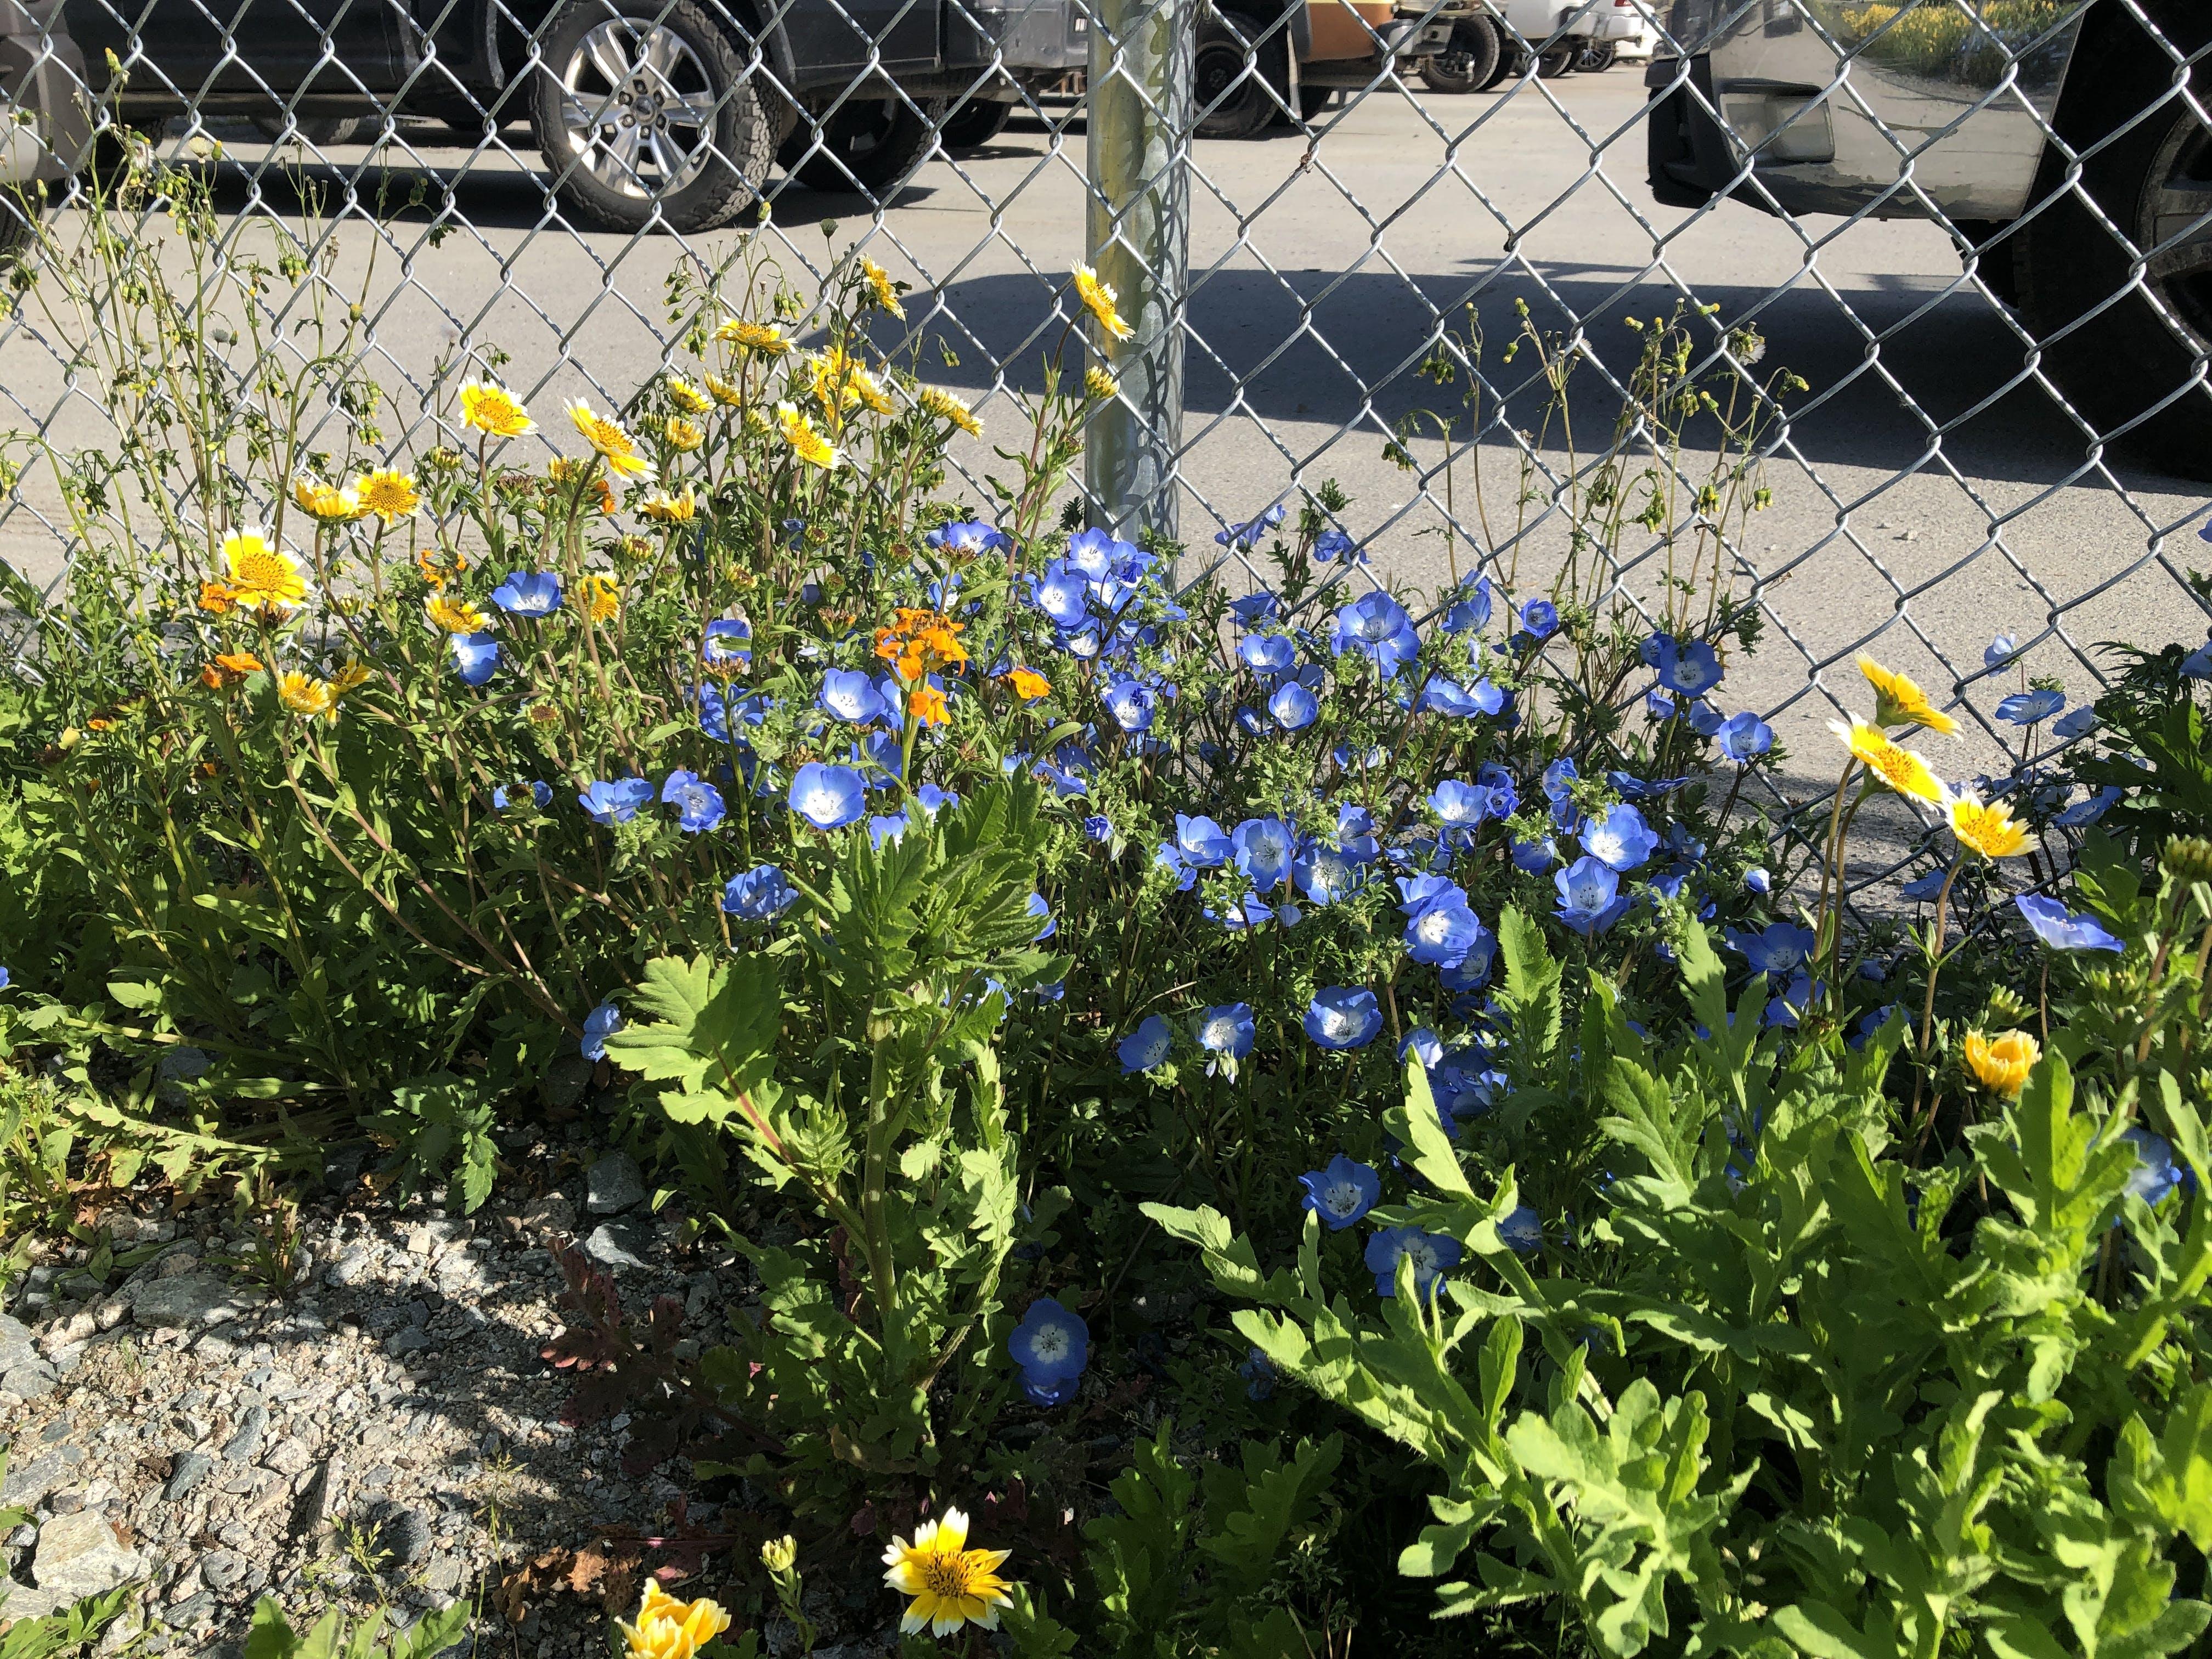 Pollinator Meadow - May 11, 2021